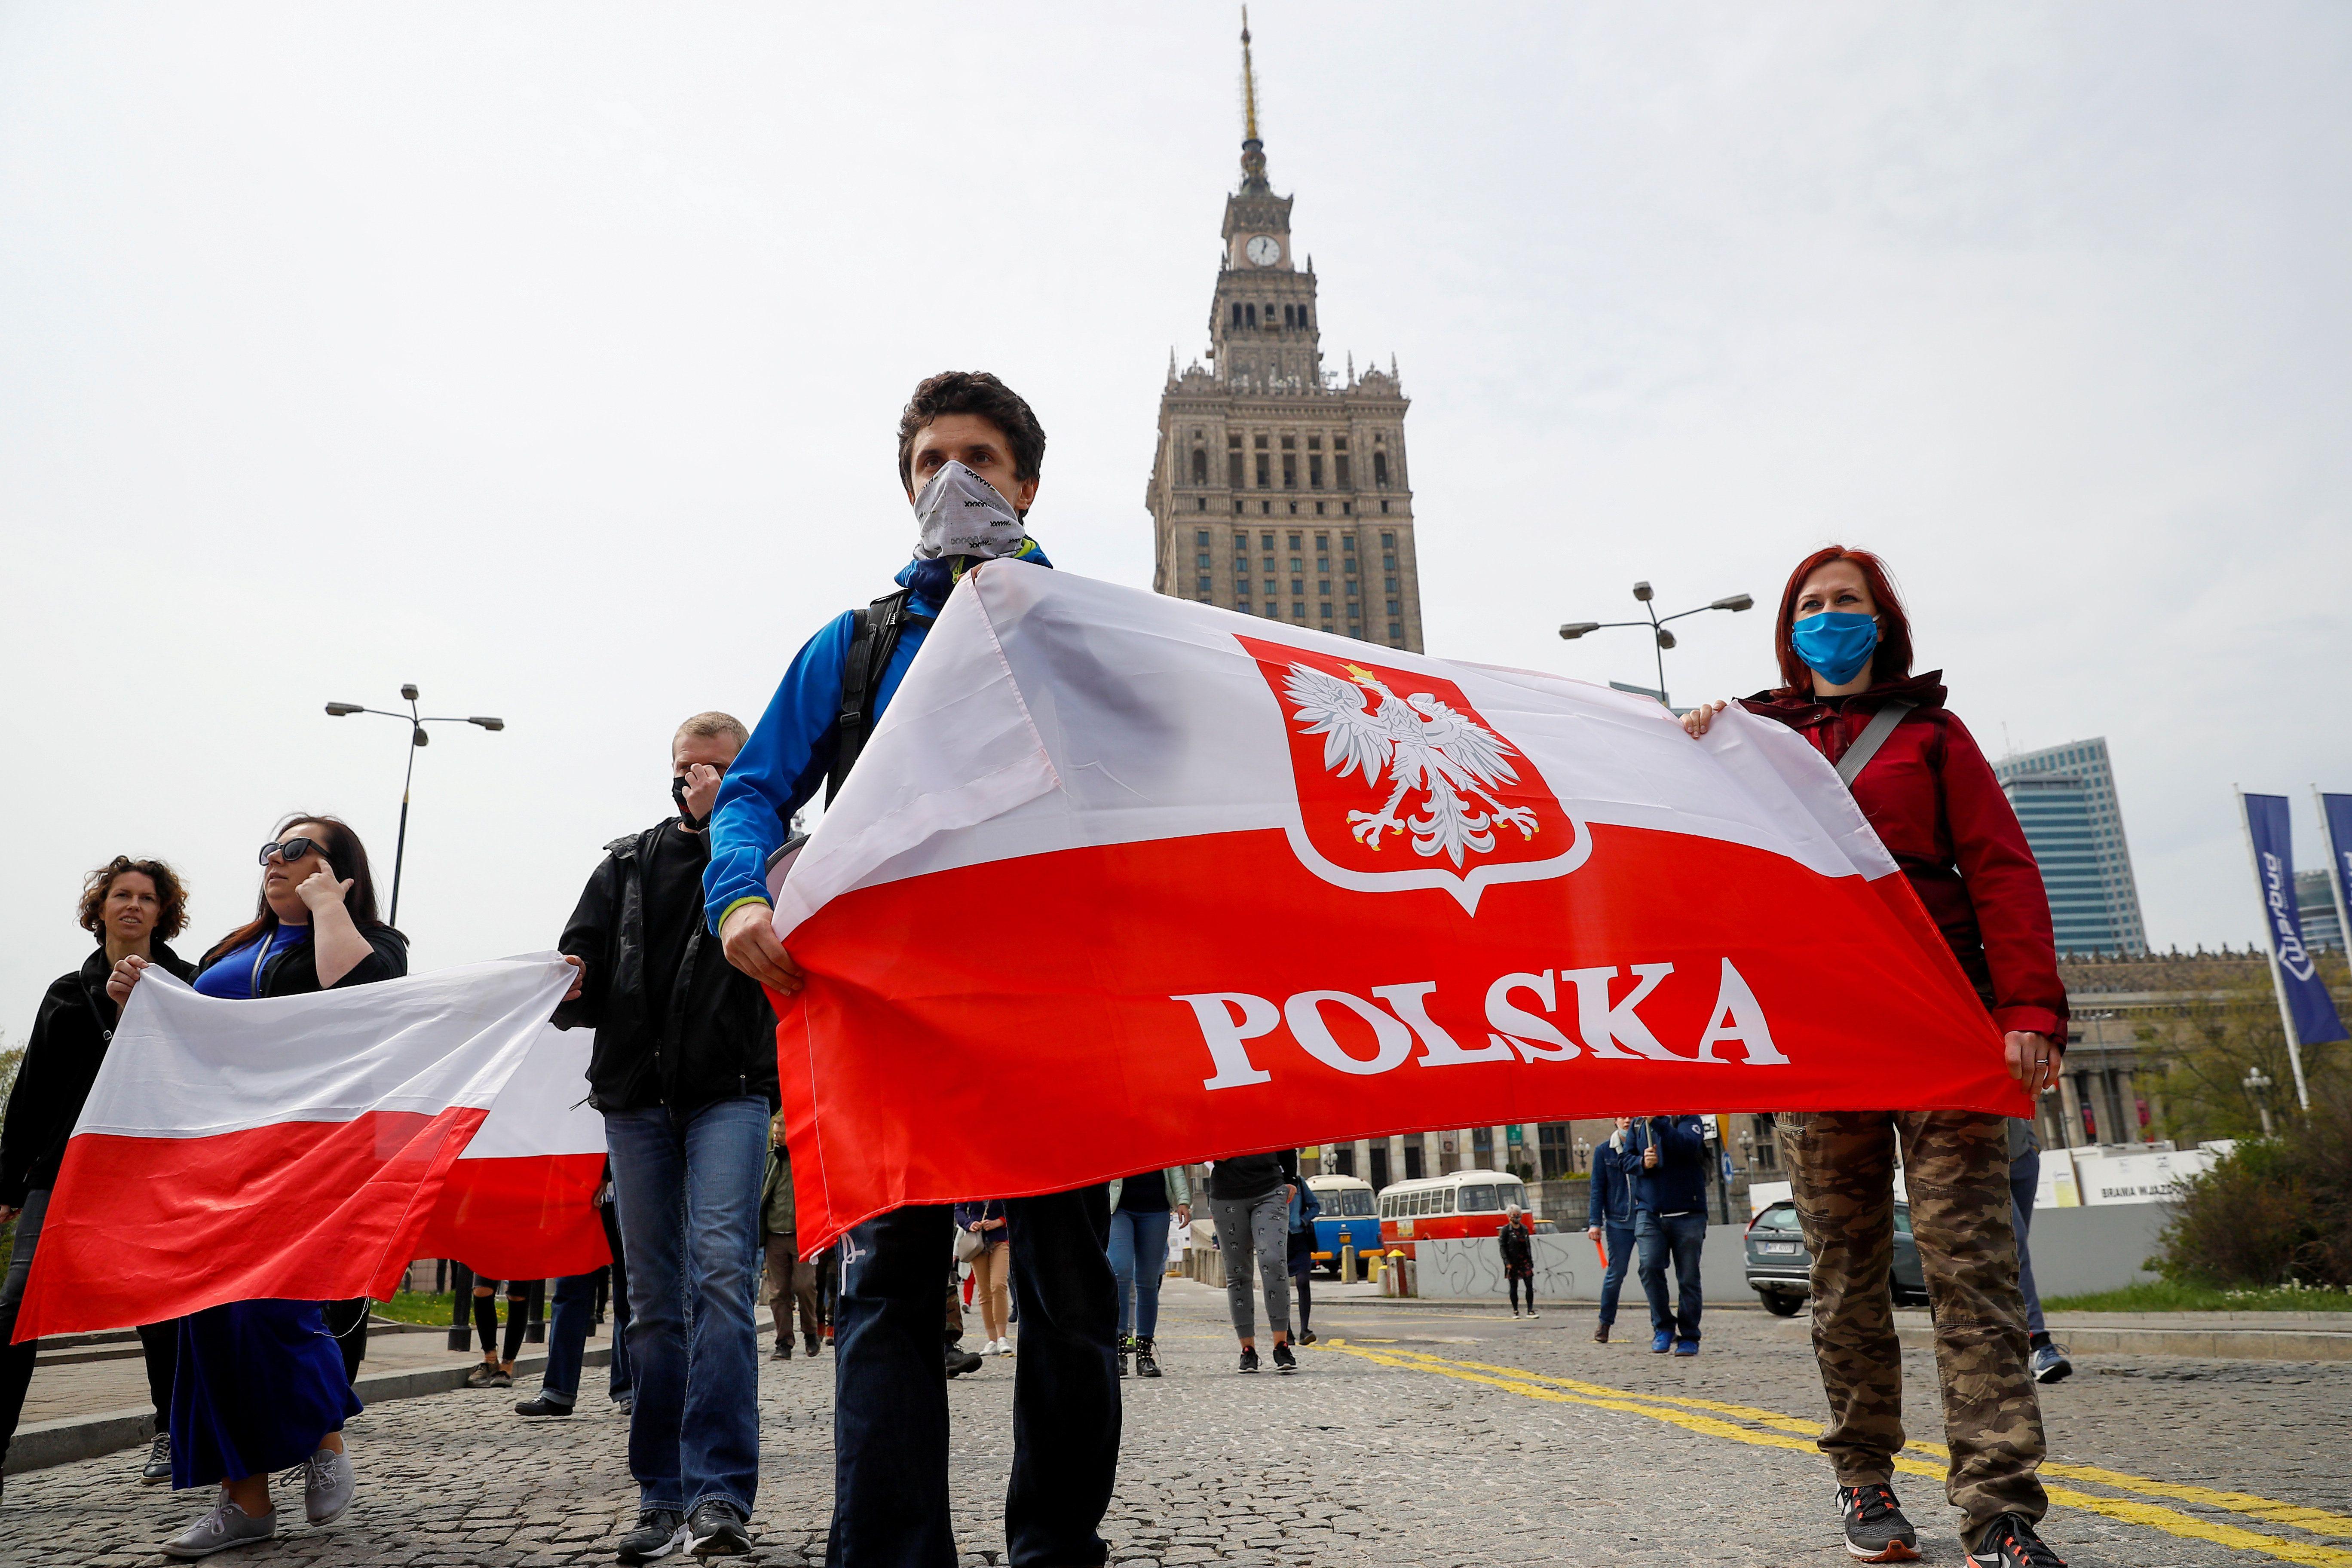 Coronavirus Politics Daily: Poland's election, Iraq on the rocks, the Peruvian urban exodus